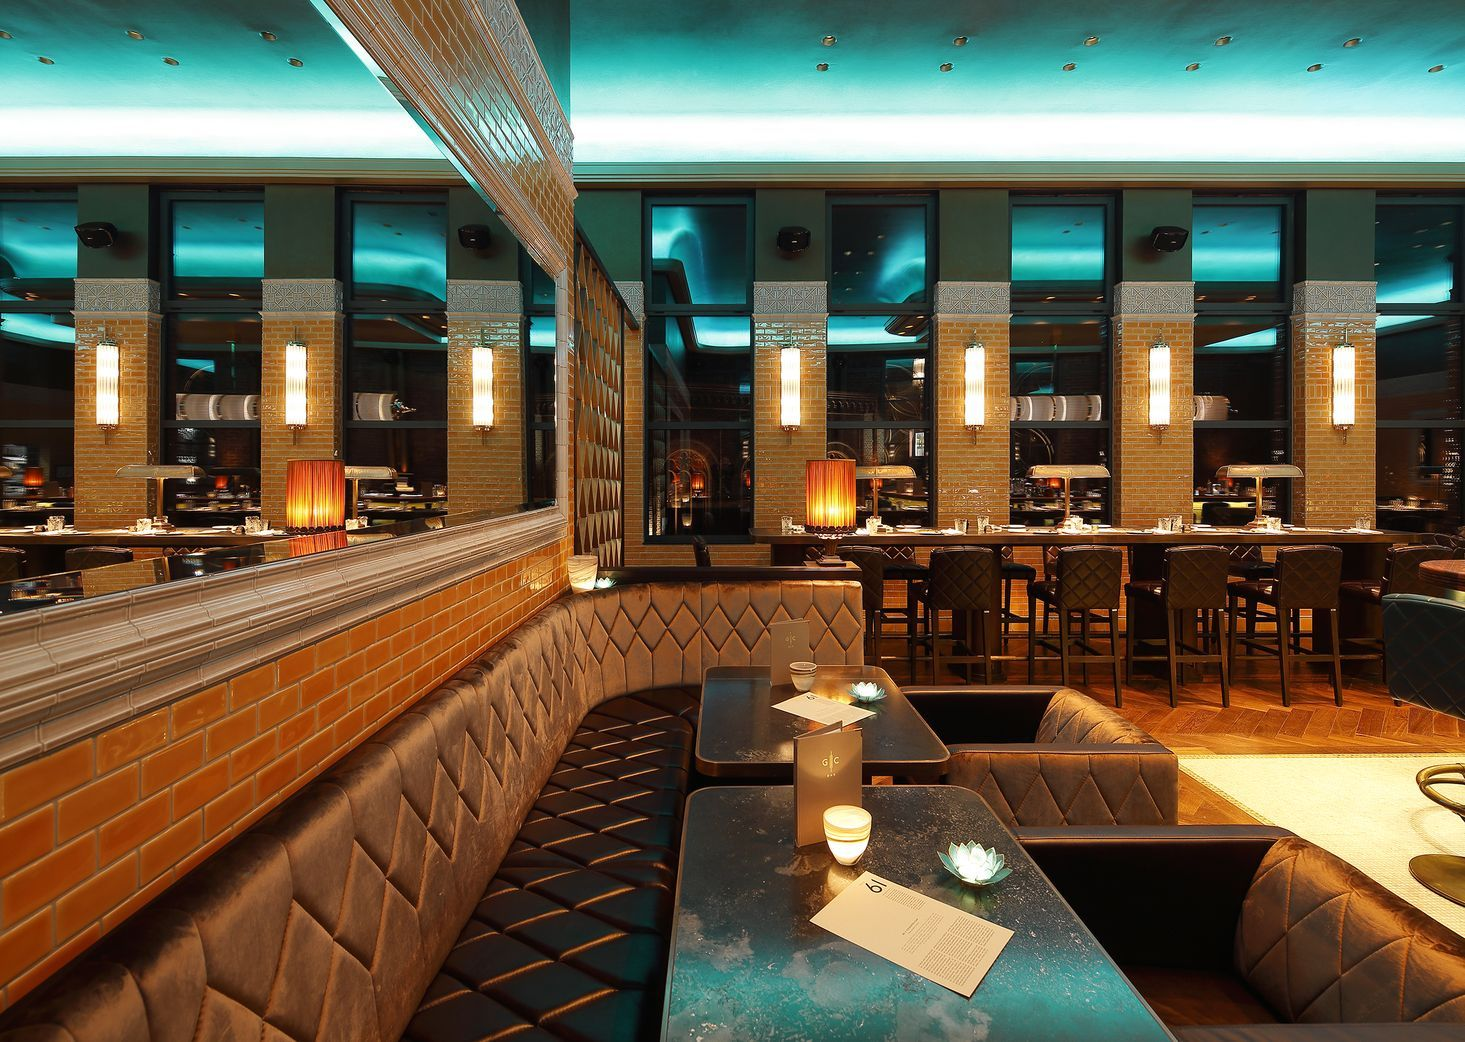 restaurant bar hohoffs 800 the golden cage bar einrichtung hotel. Black Bedroom Furniture Sets. Home Design Ideas